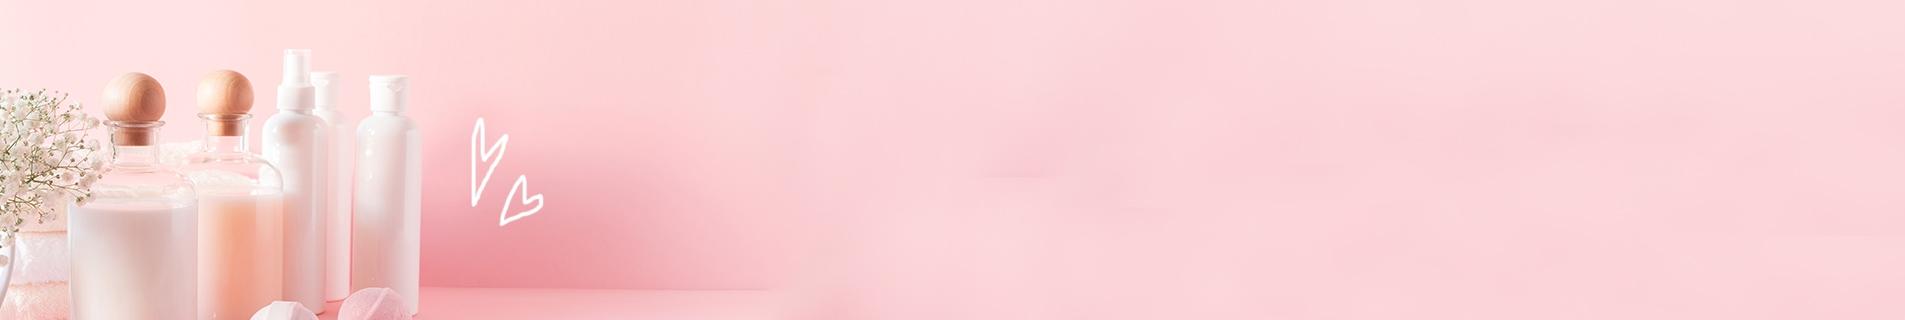 Promo beauté SAGA Cosmetics | Site de maquillage pas cher